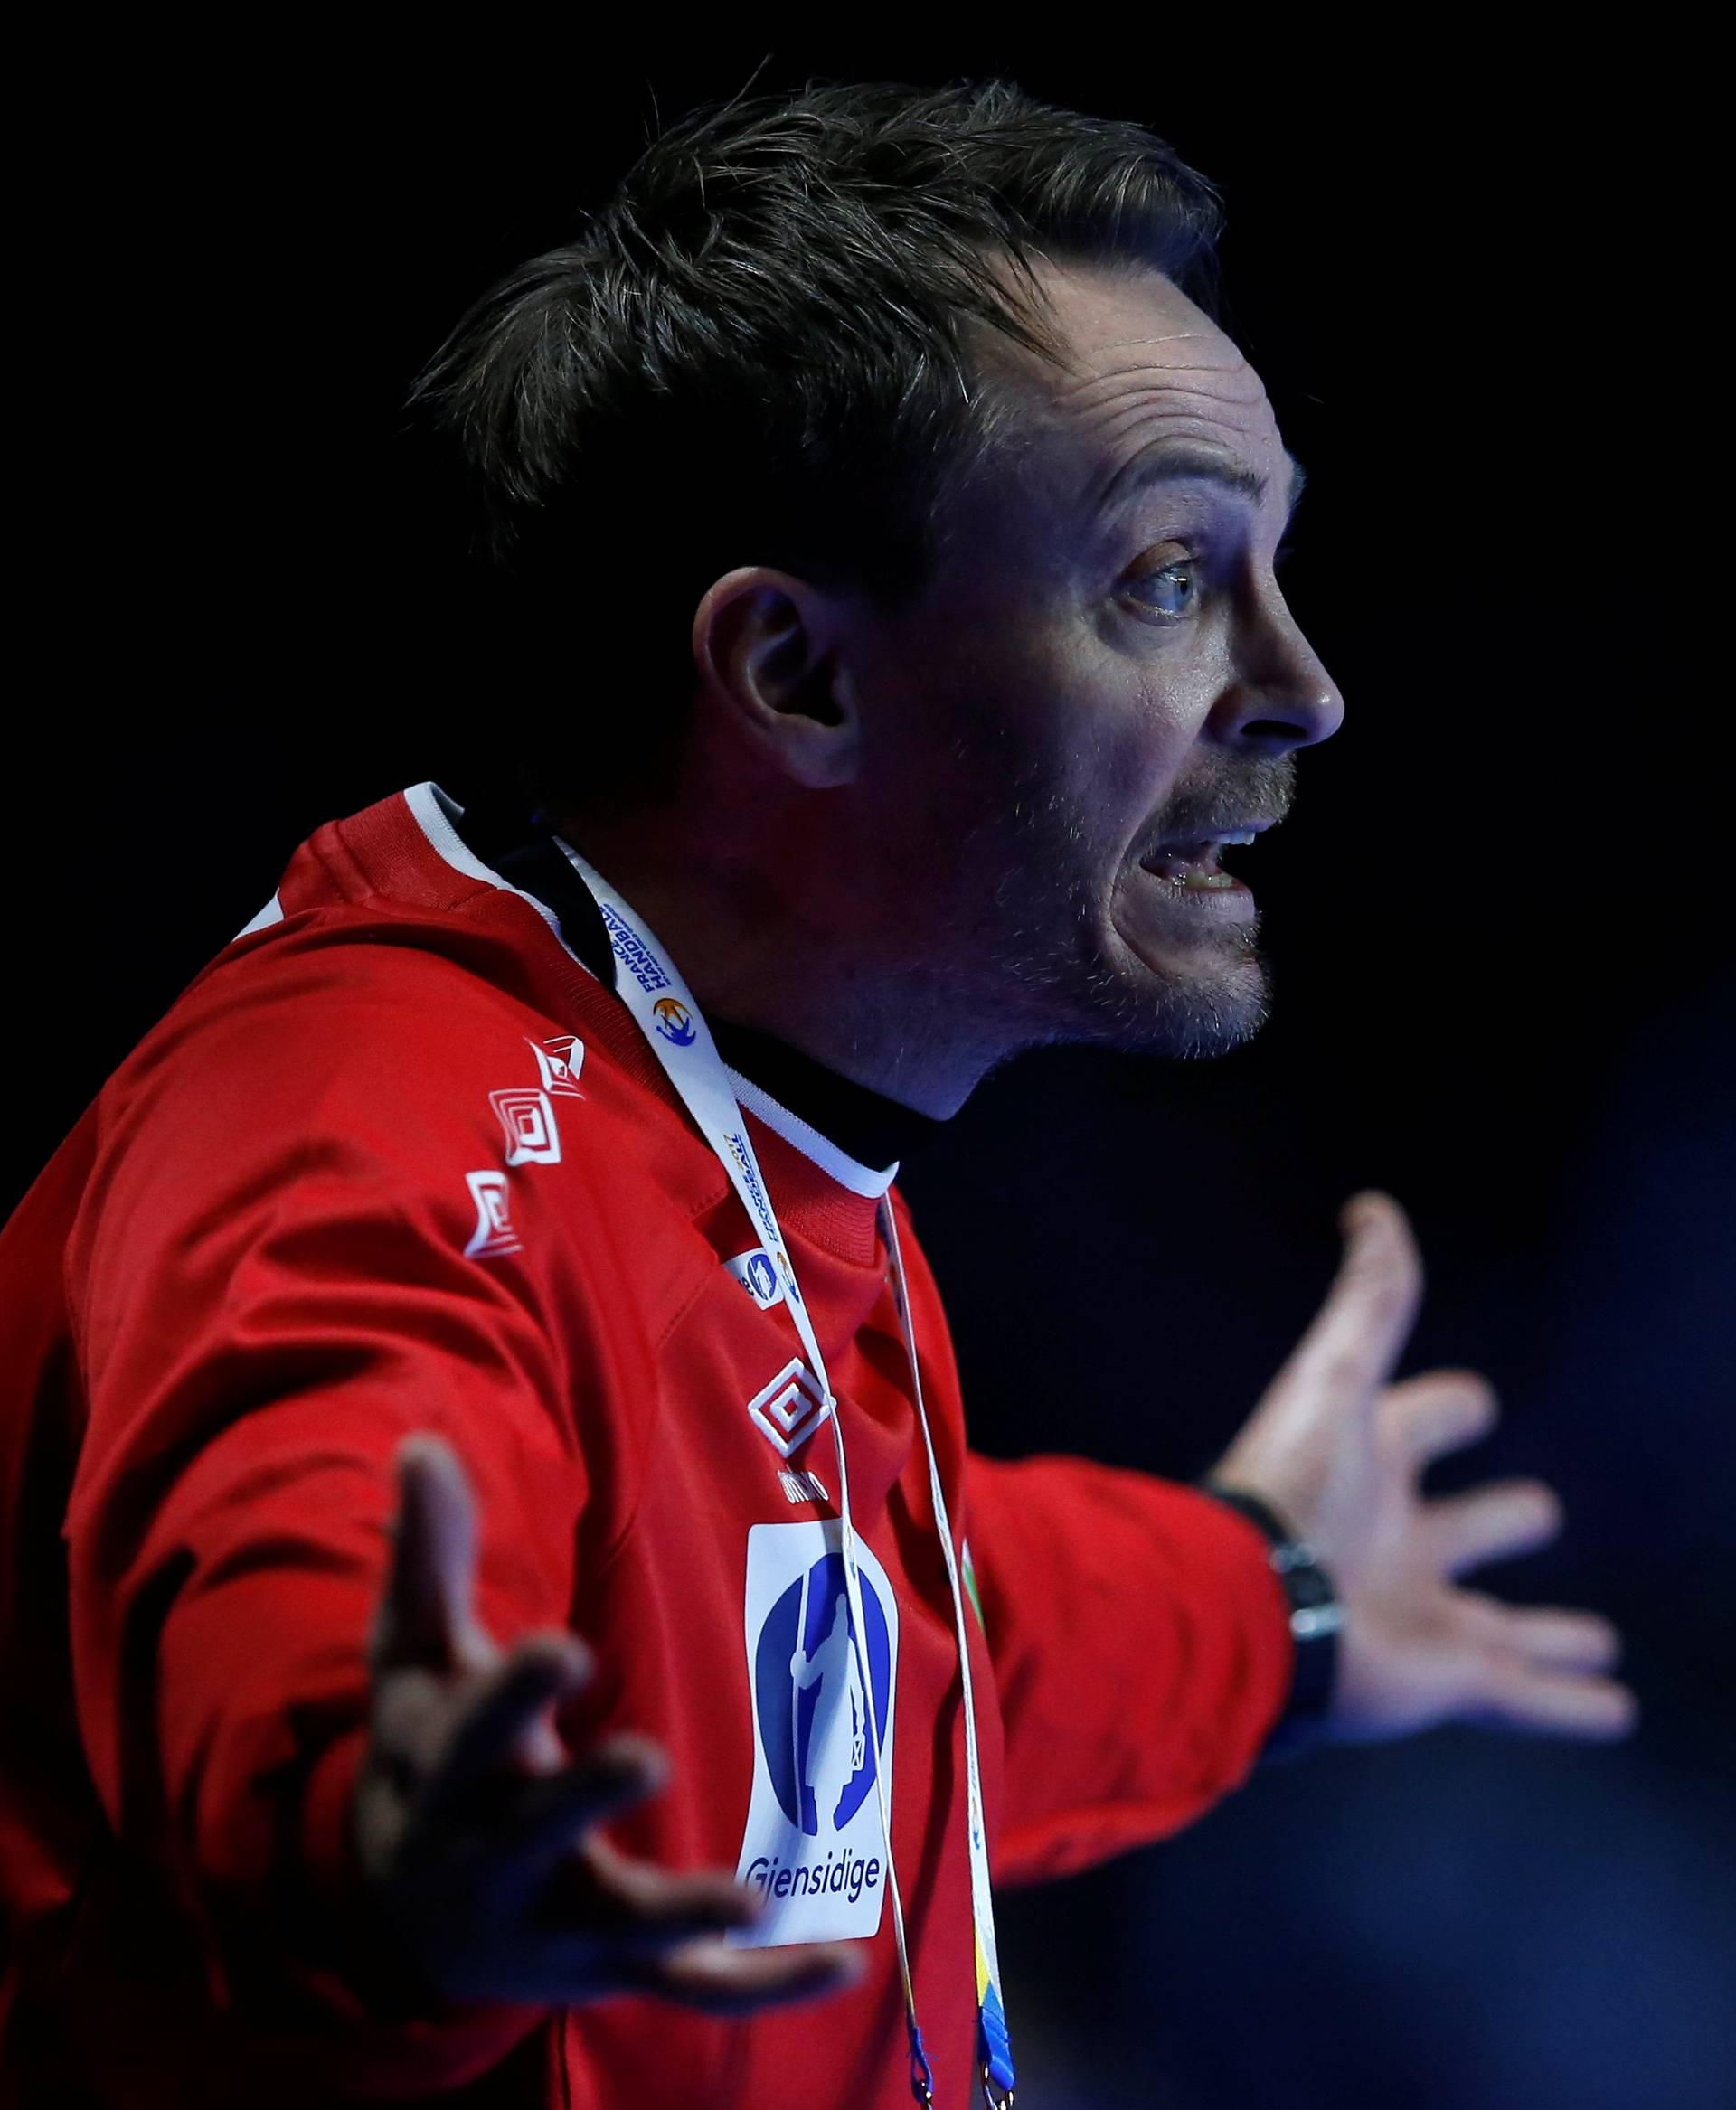 Men's Handball - Norway v Russia - 2017 Men's World Championship Main Round - Group A